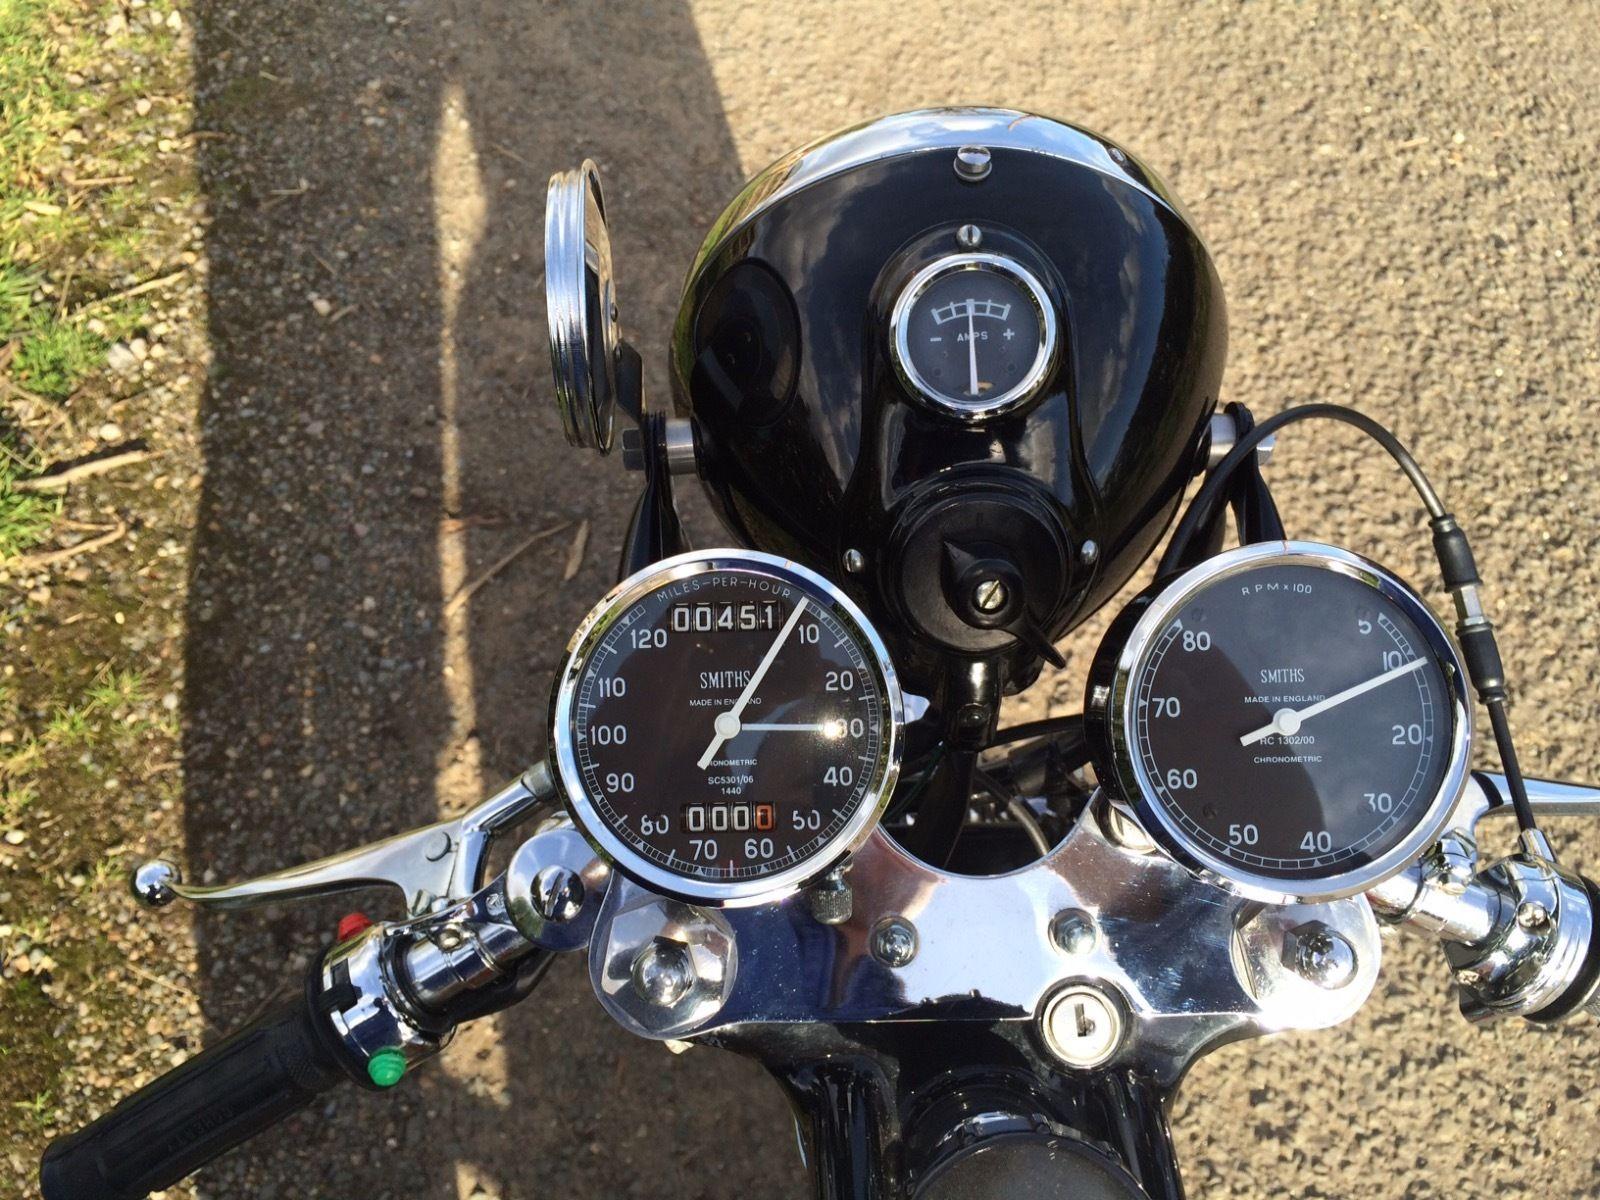 BSA Gold Star Replica - 1960 - Clocks, Speedo and Tacho, Gauges and Headlight.